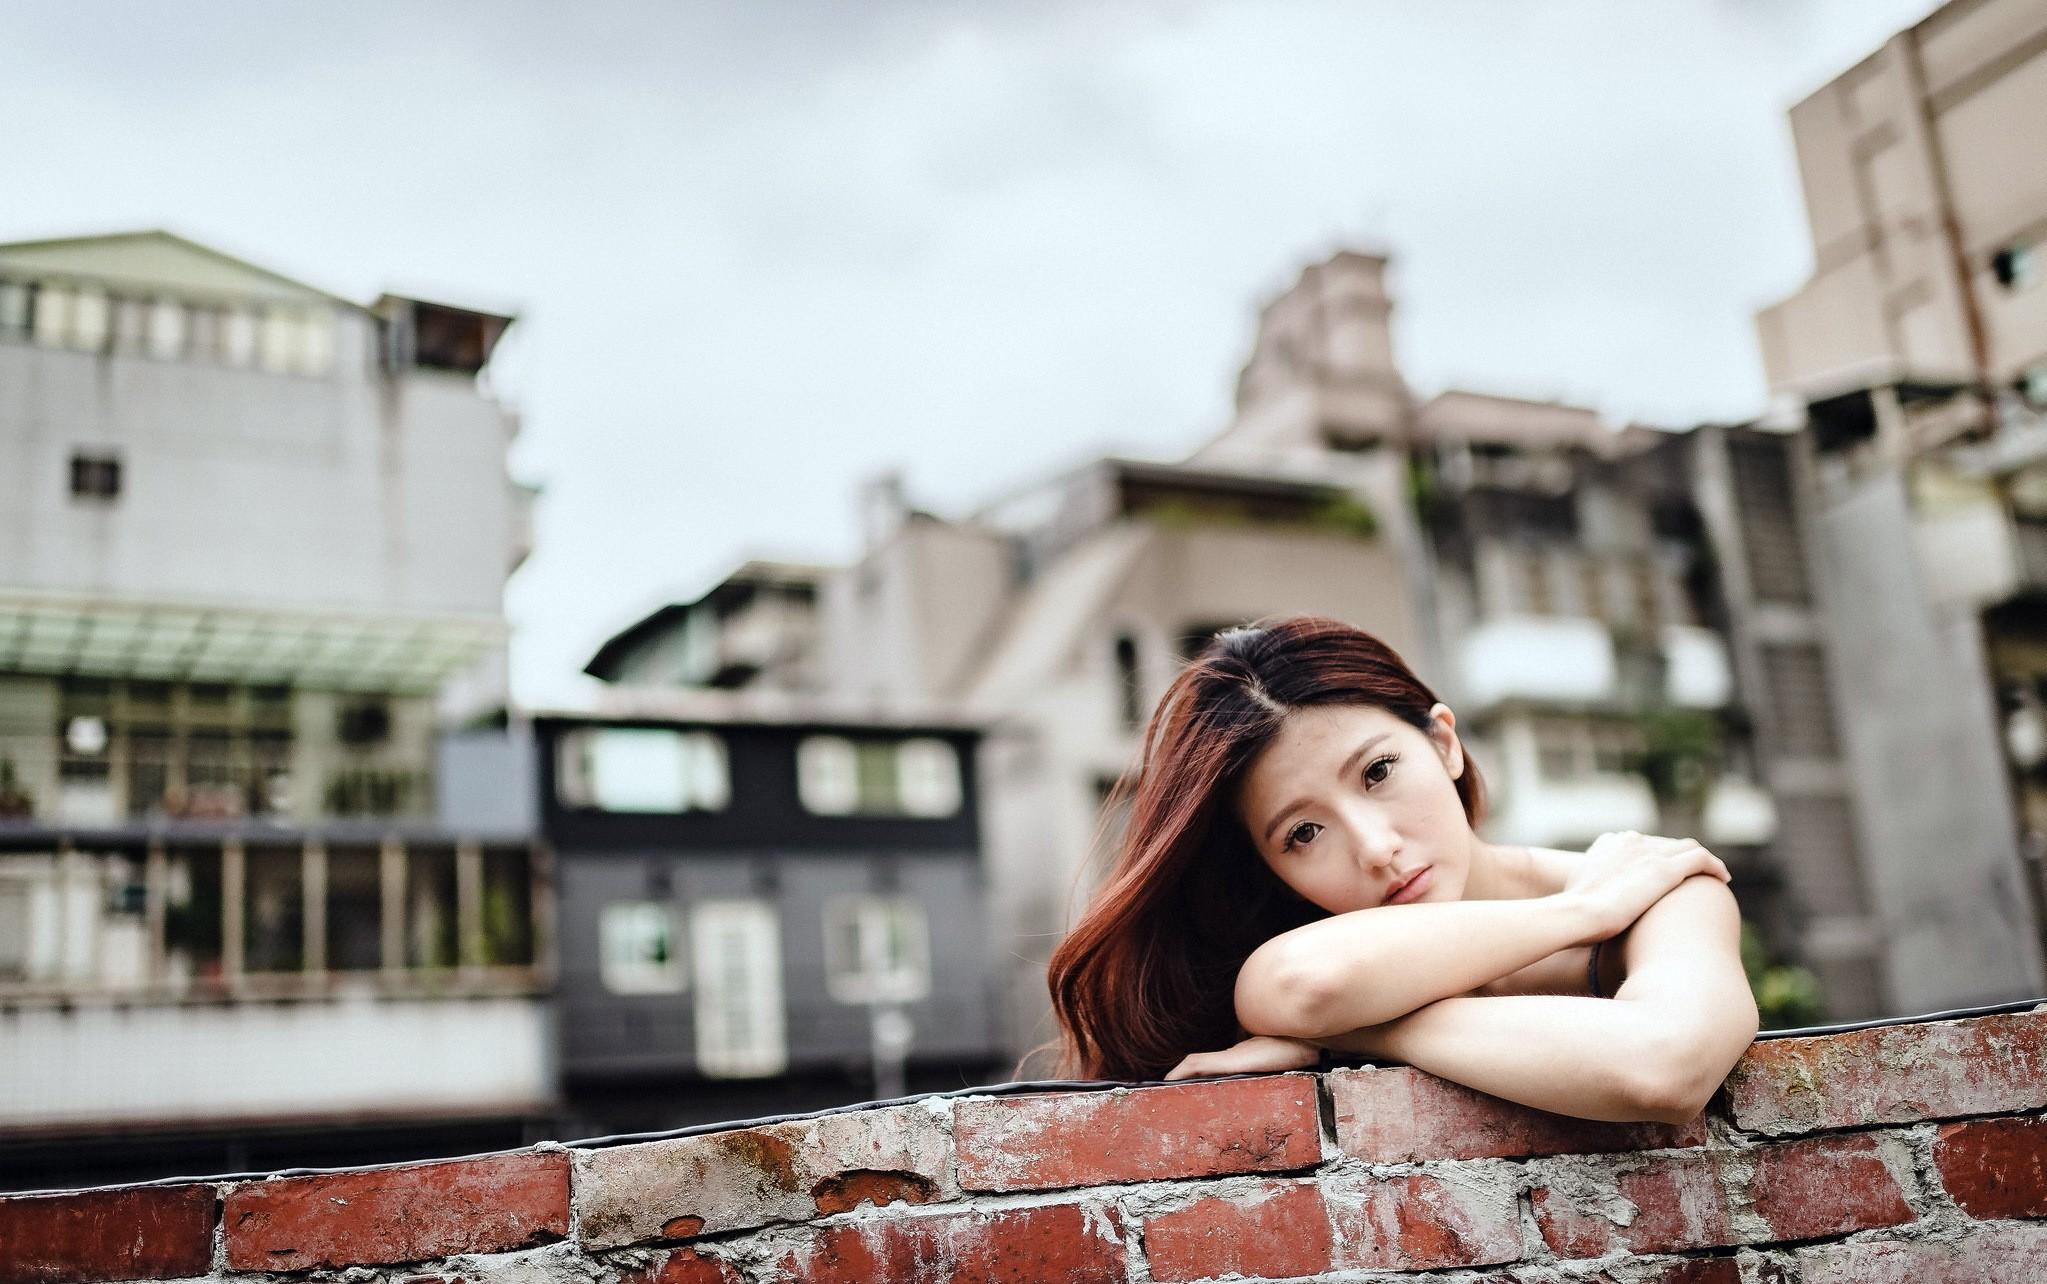 People 2047x1284 wall urban Asian women model